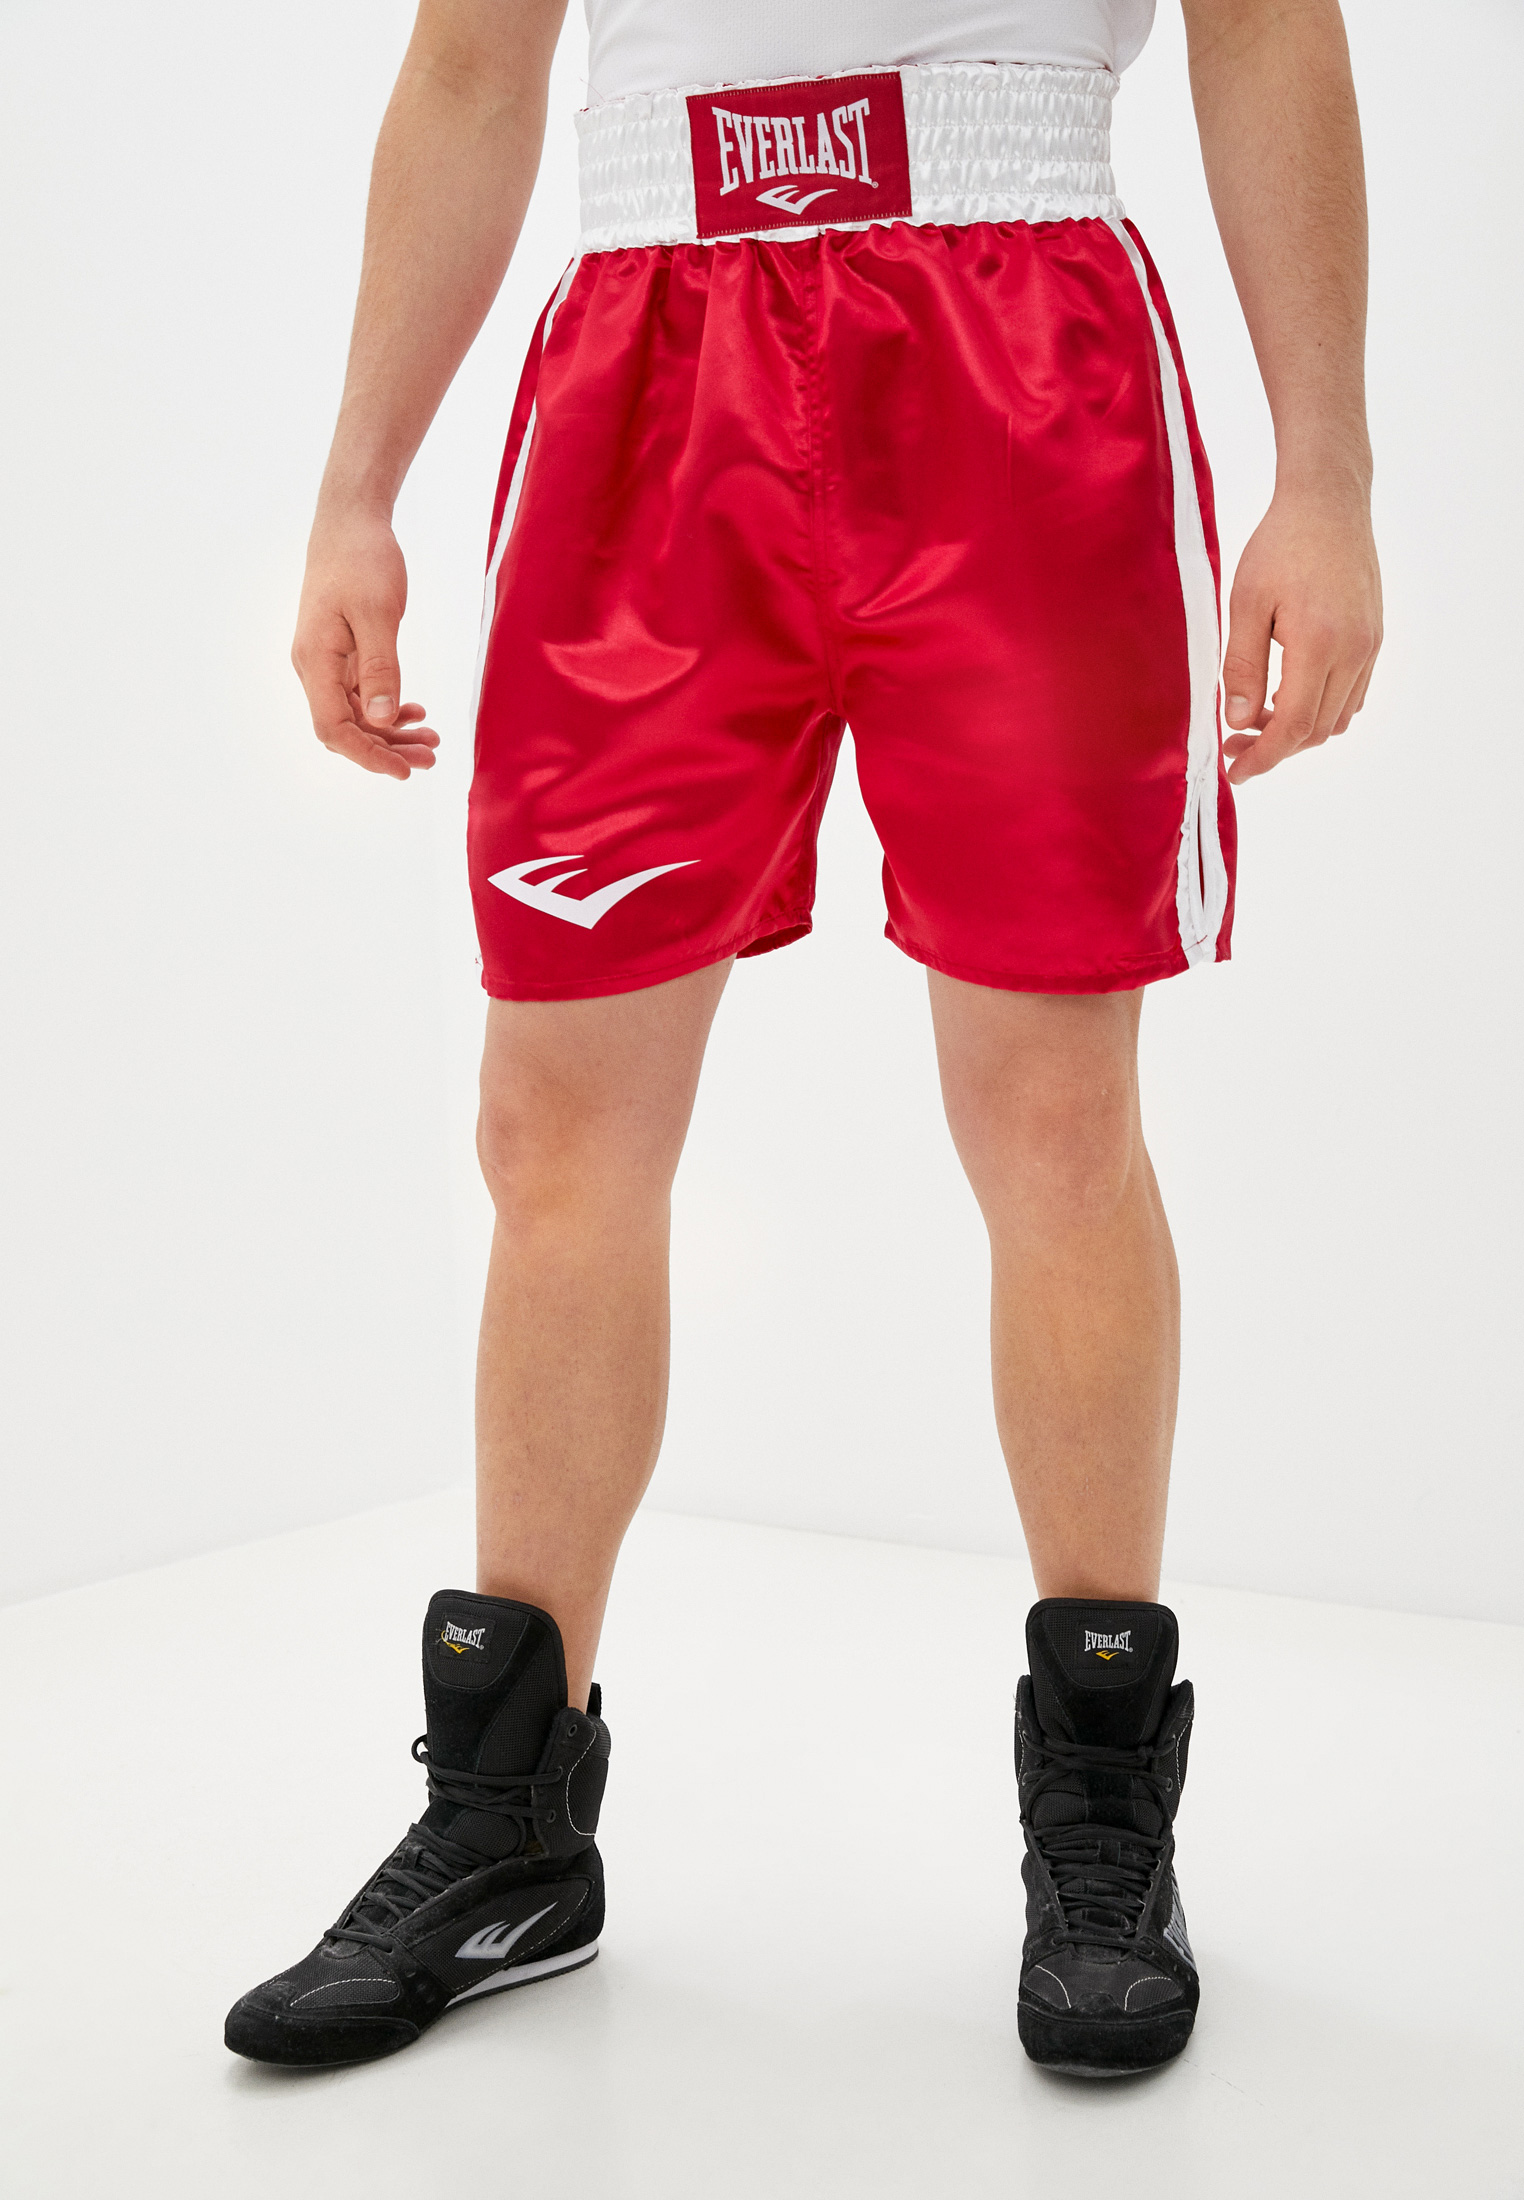 Мужские спортивные шорты Everlast (Эверласт) 4412